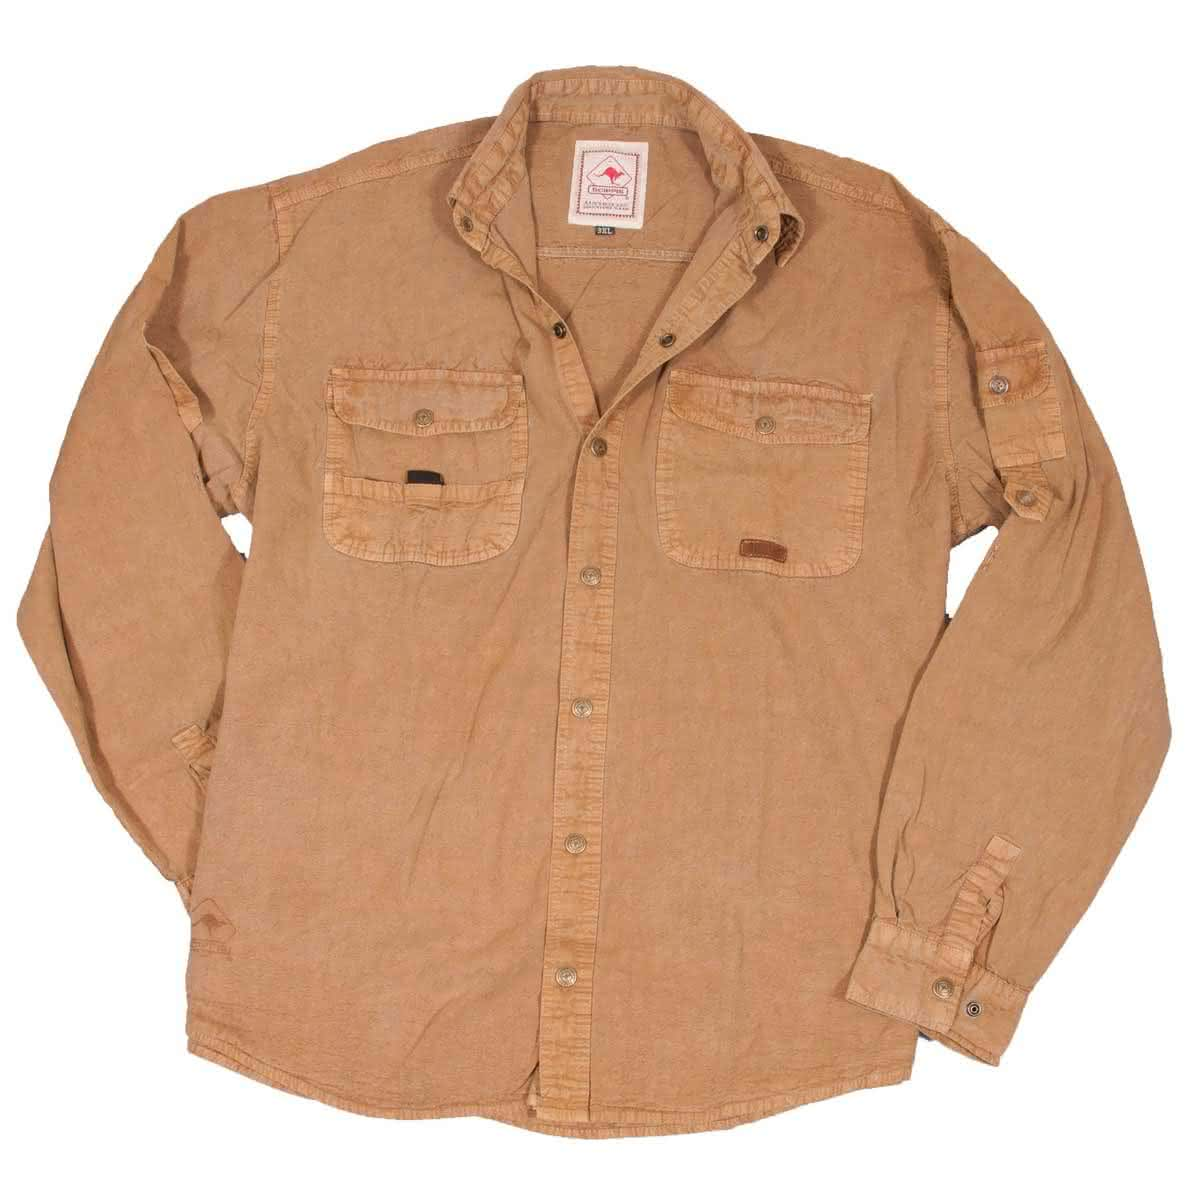 Scippis Cowra Shirt-tobacco-M